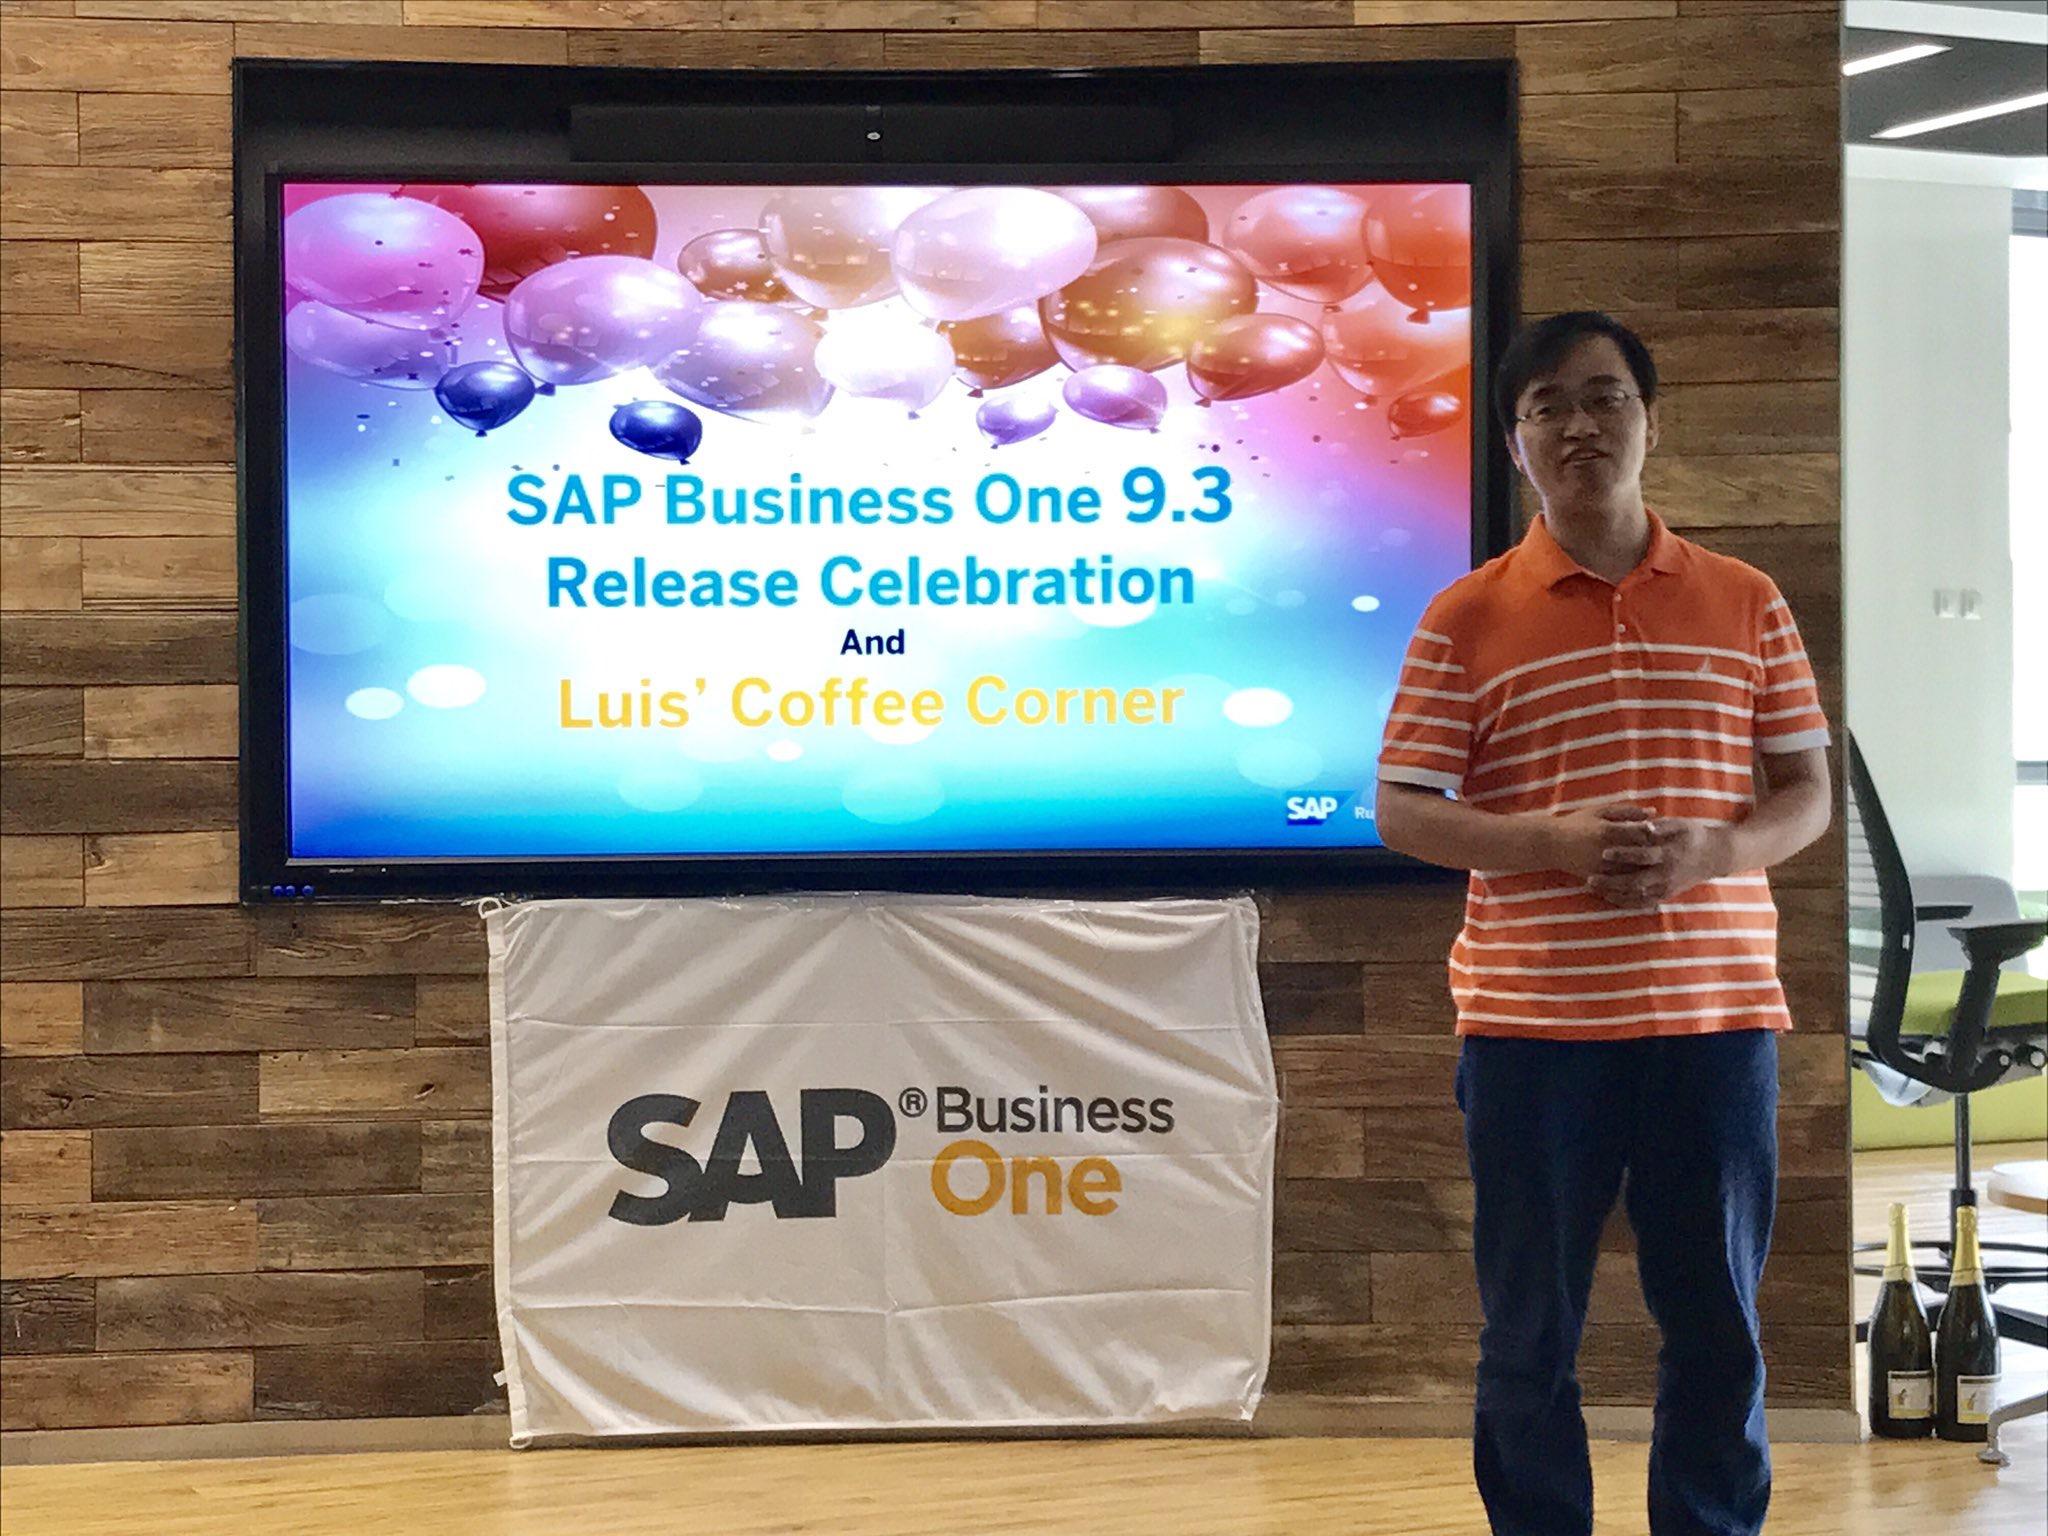 SAP_Business_One93-1.jpg